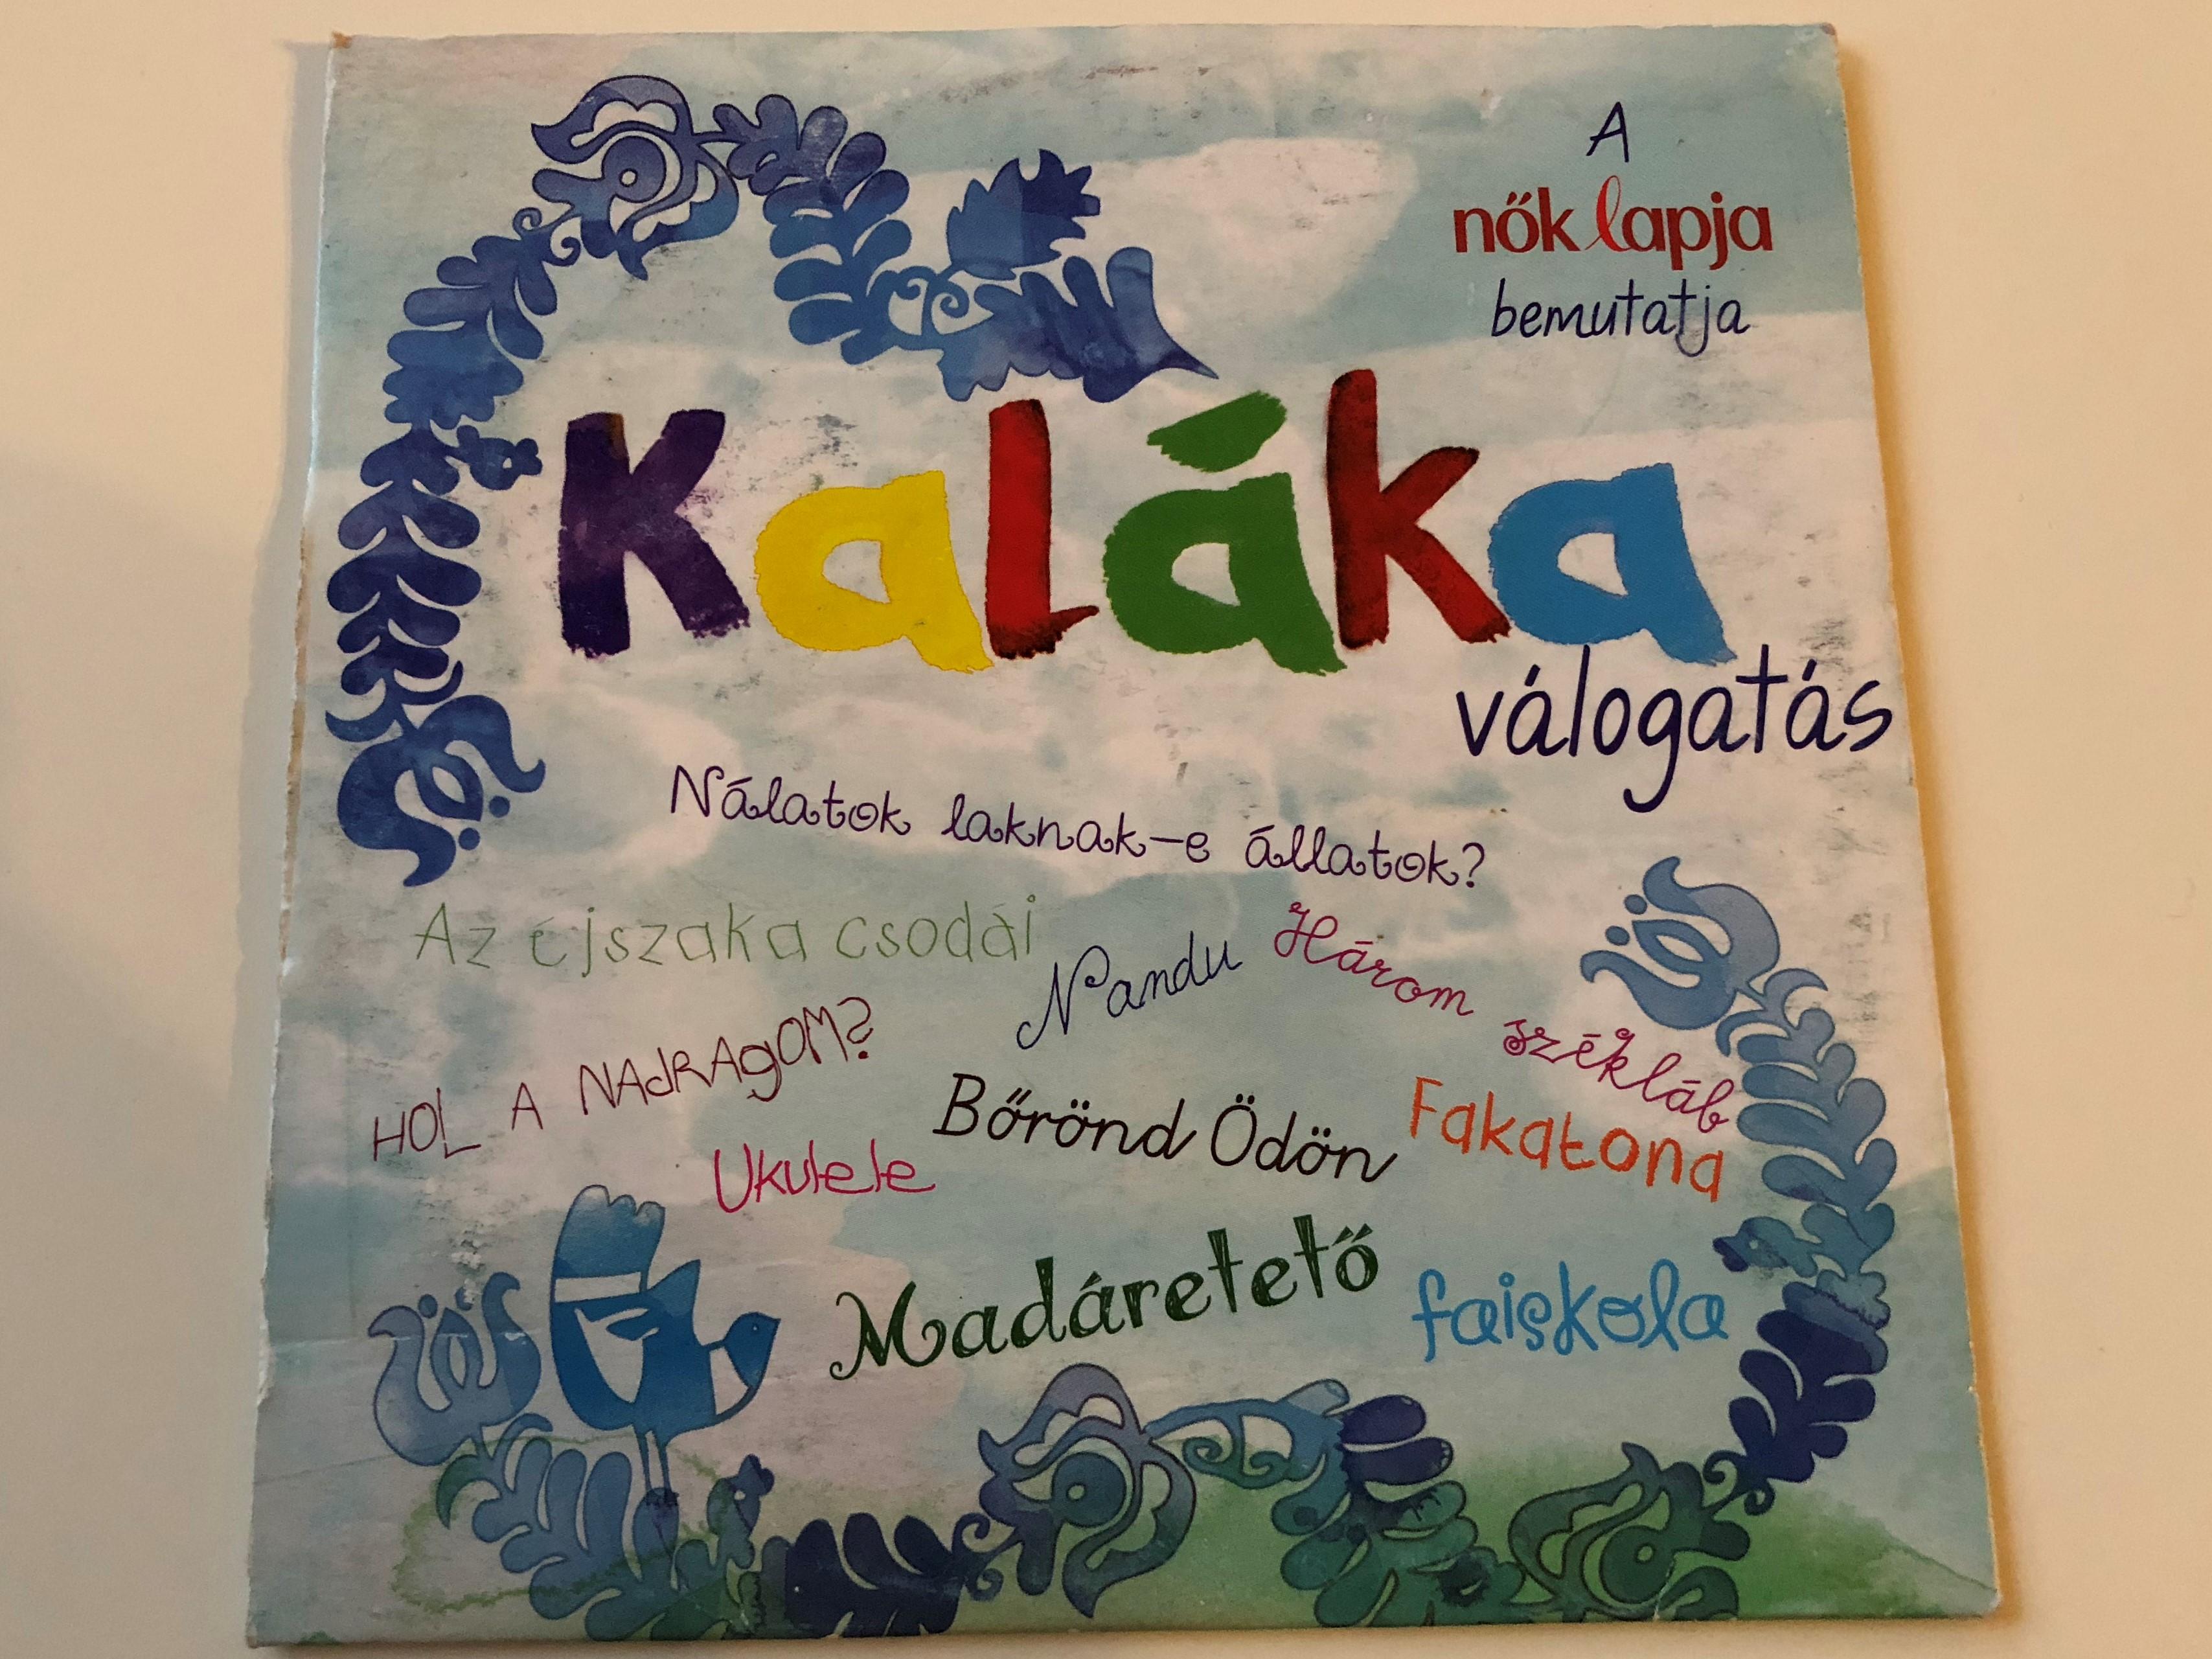 a-nok-lapja-bemutatja-kalaka-valogatas-nalatok-laknak-e-allatok-nandu-fakatona-borond-odon-madareteto-faiskola-ukulele-gryllus-kiado-audio-cd-2012-gcd-120-1-.jpg